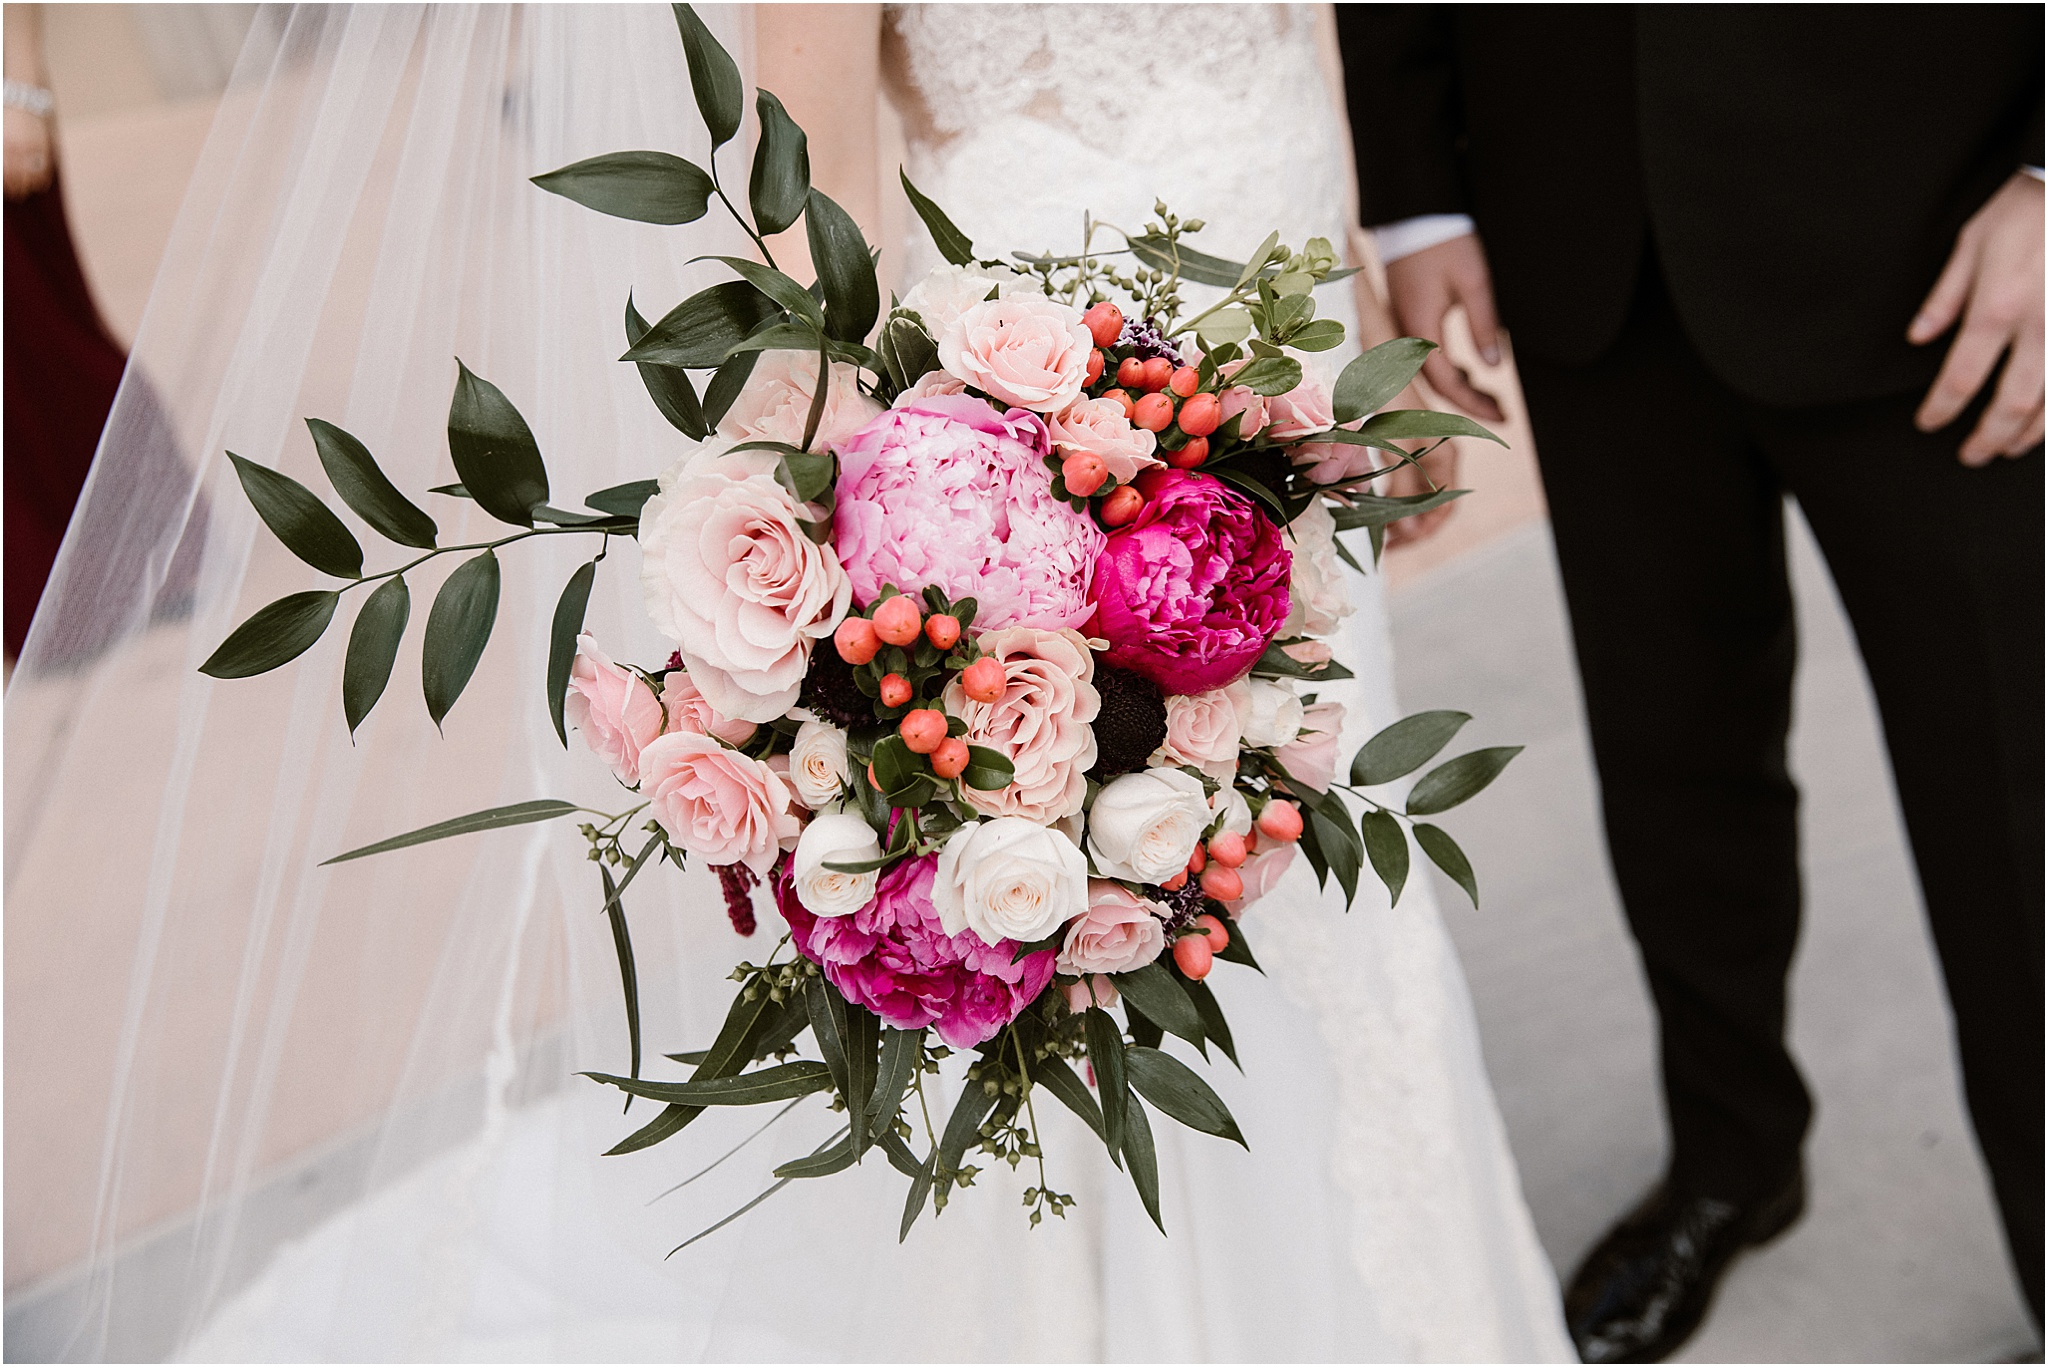 JENNA_JEROME_BLUE ROSE PHOTOGRAPHY_ABQ WEDDING_25